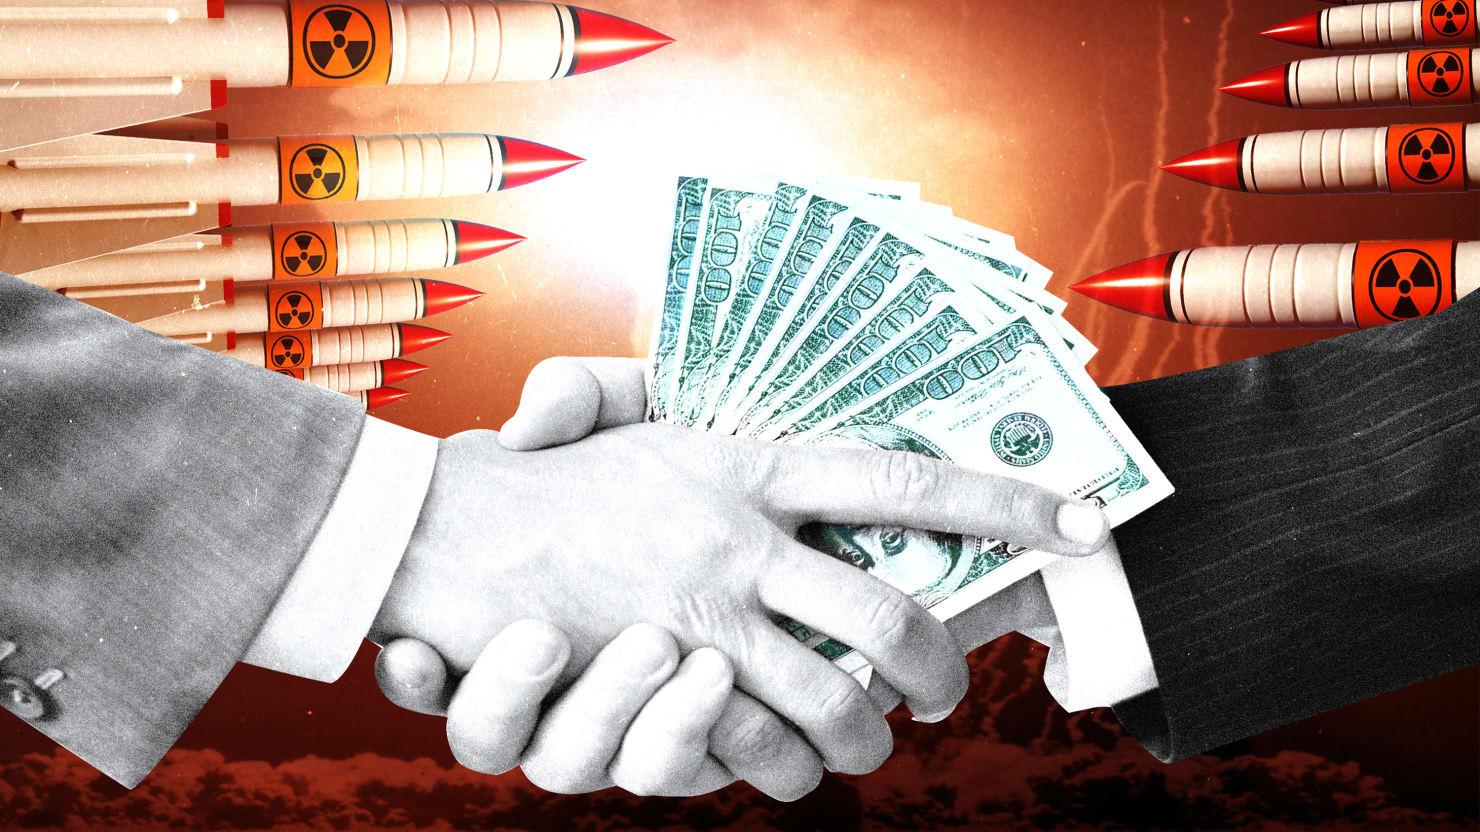 Alert: Trump Admin Gives OK to Sell Nuclear Tech to Saudi Arabia